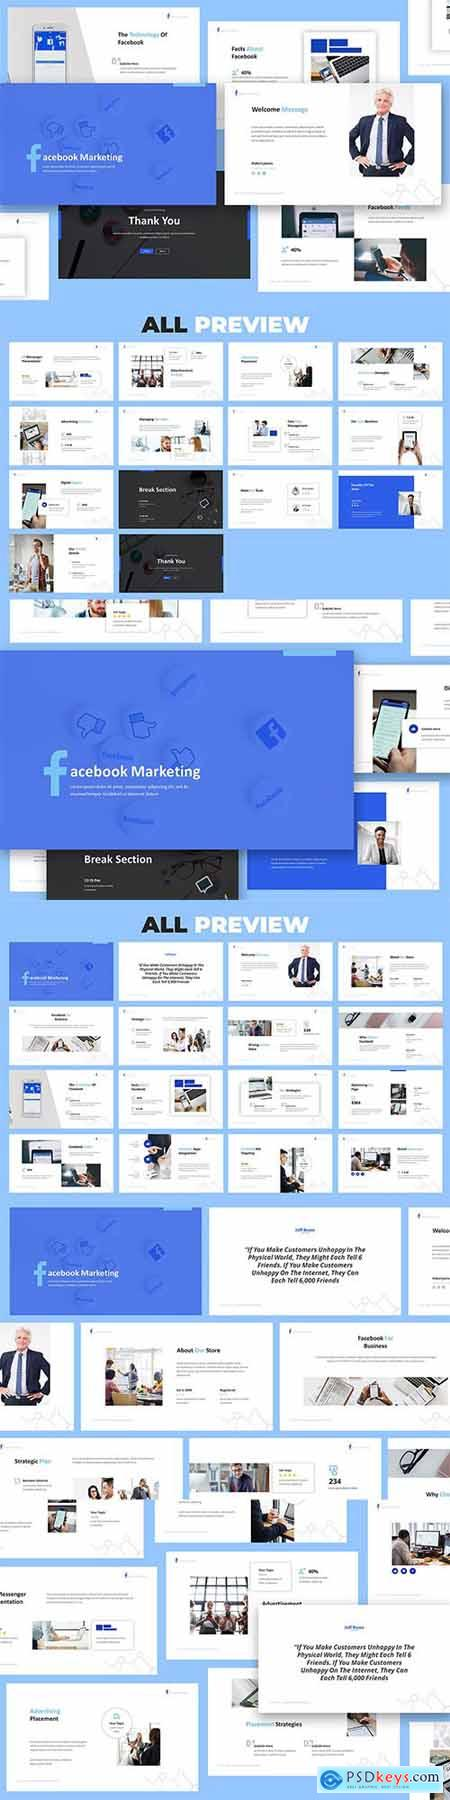 Facebook Marketing Powerpoint, Keynote and Google Slides Presentation